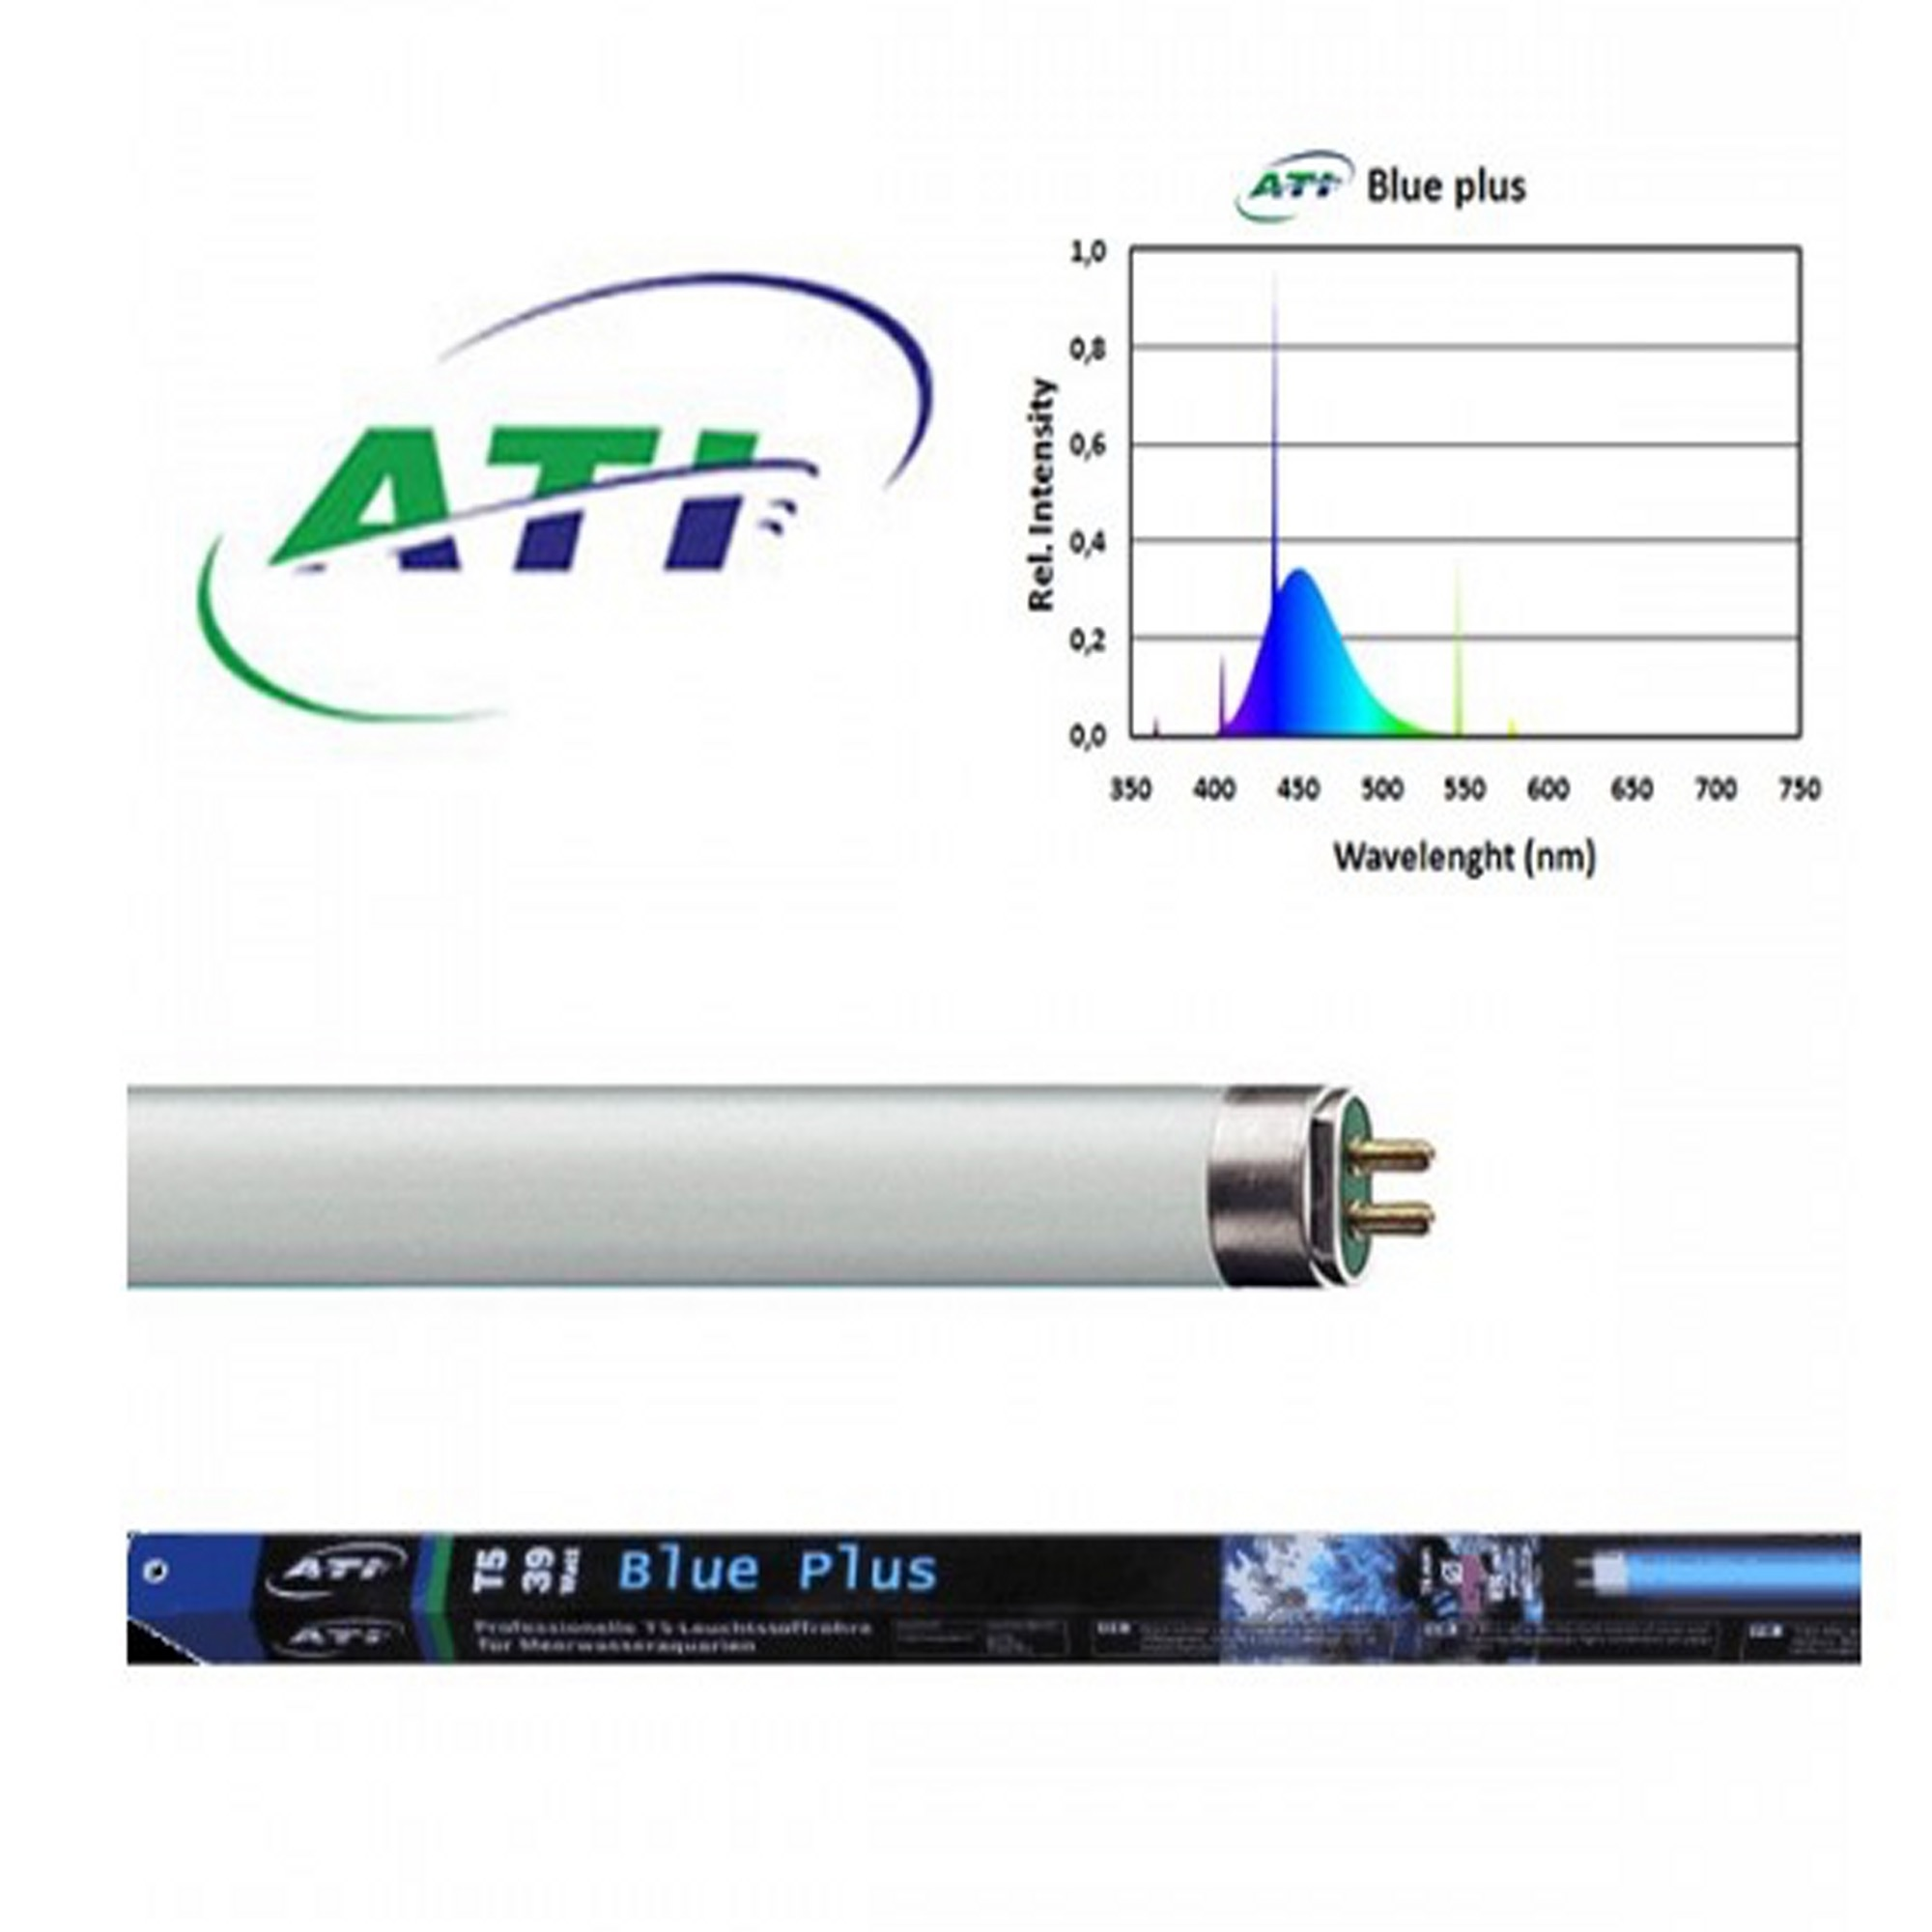 Лампы Т5 ATI 54 вт